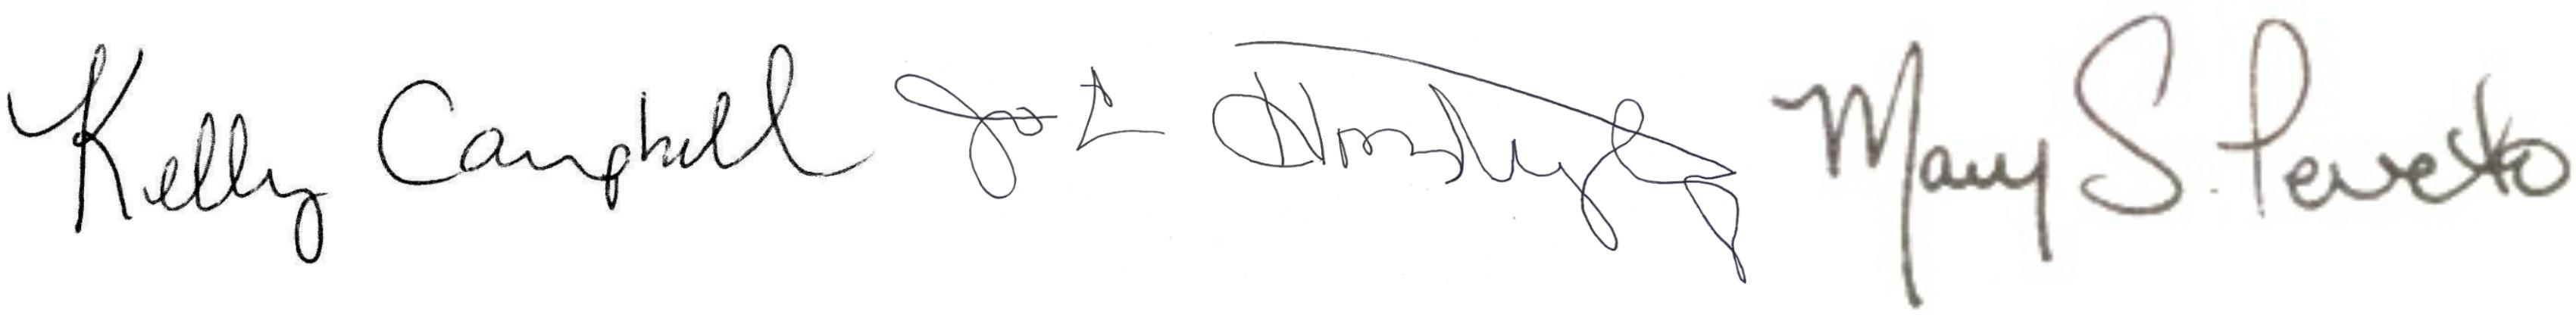 covanta_signatures.jpg